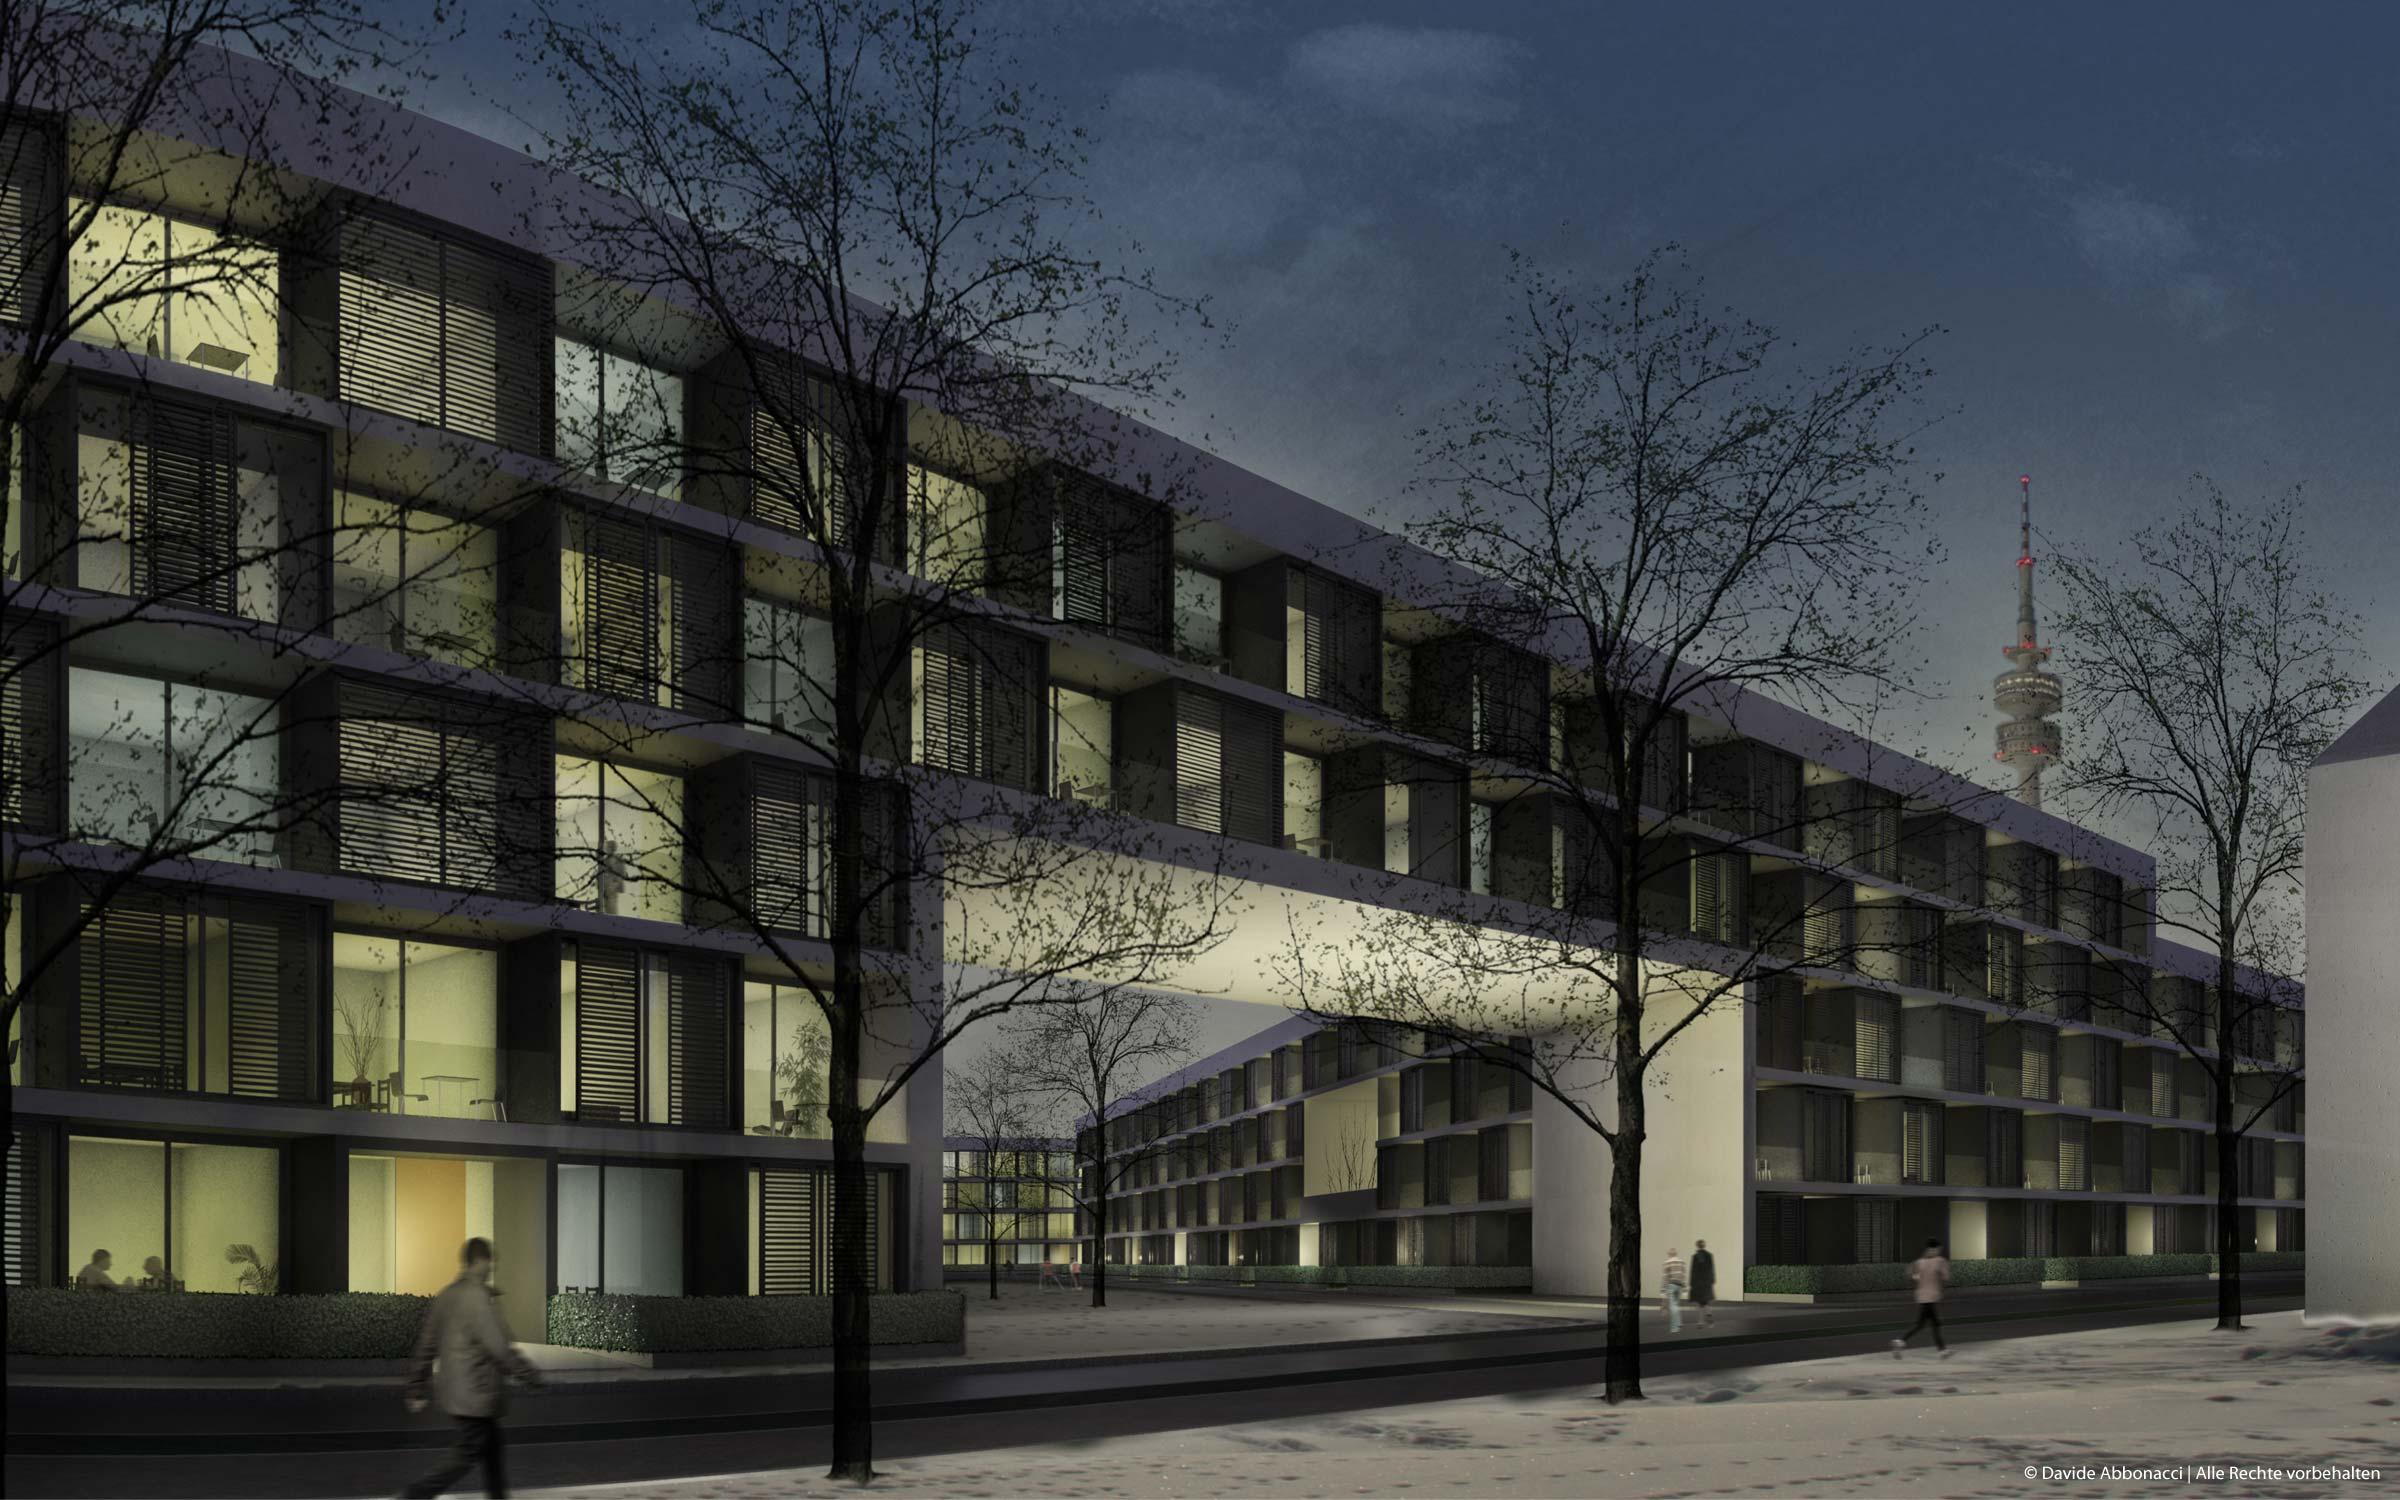 d mmerung und nachtbilder davide abbonacci 3d visualisierung berlin. Black Bedroom Furniture Sets. Home Design Ideas